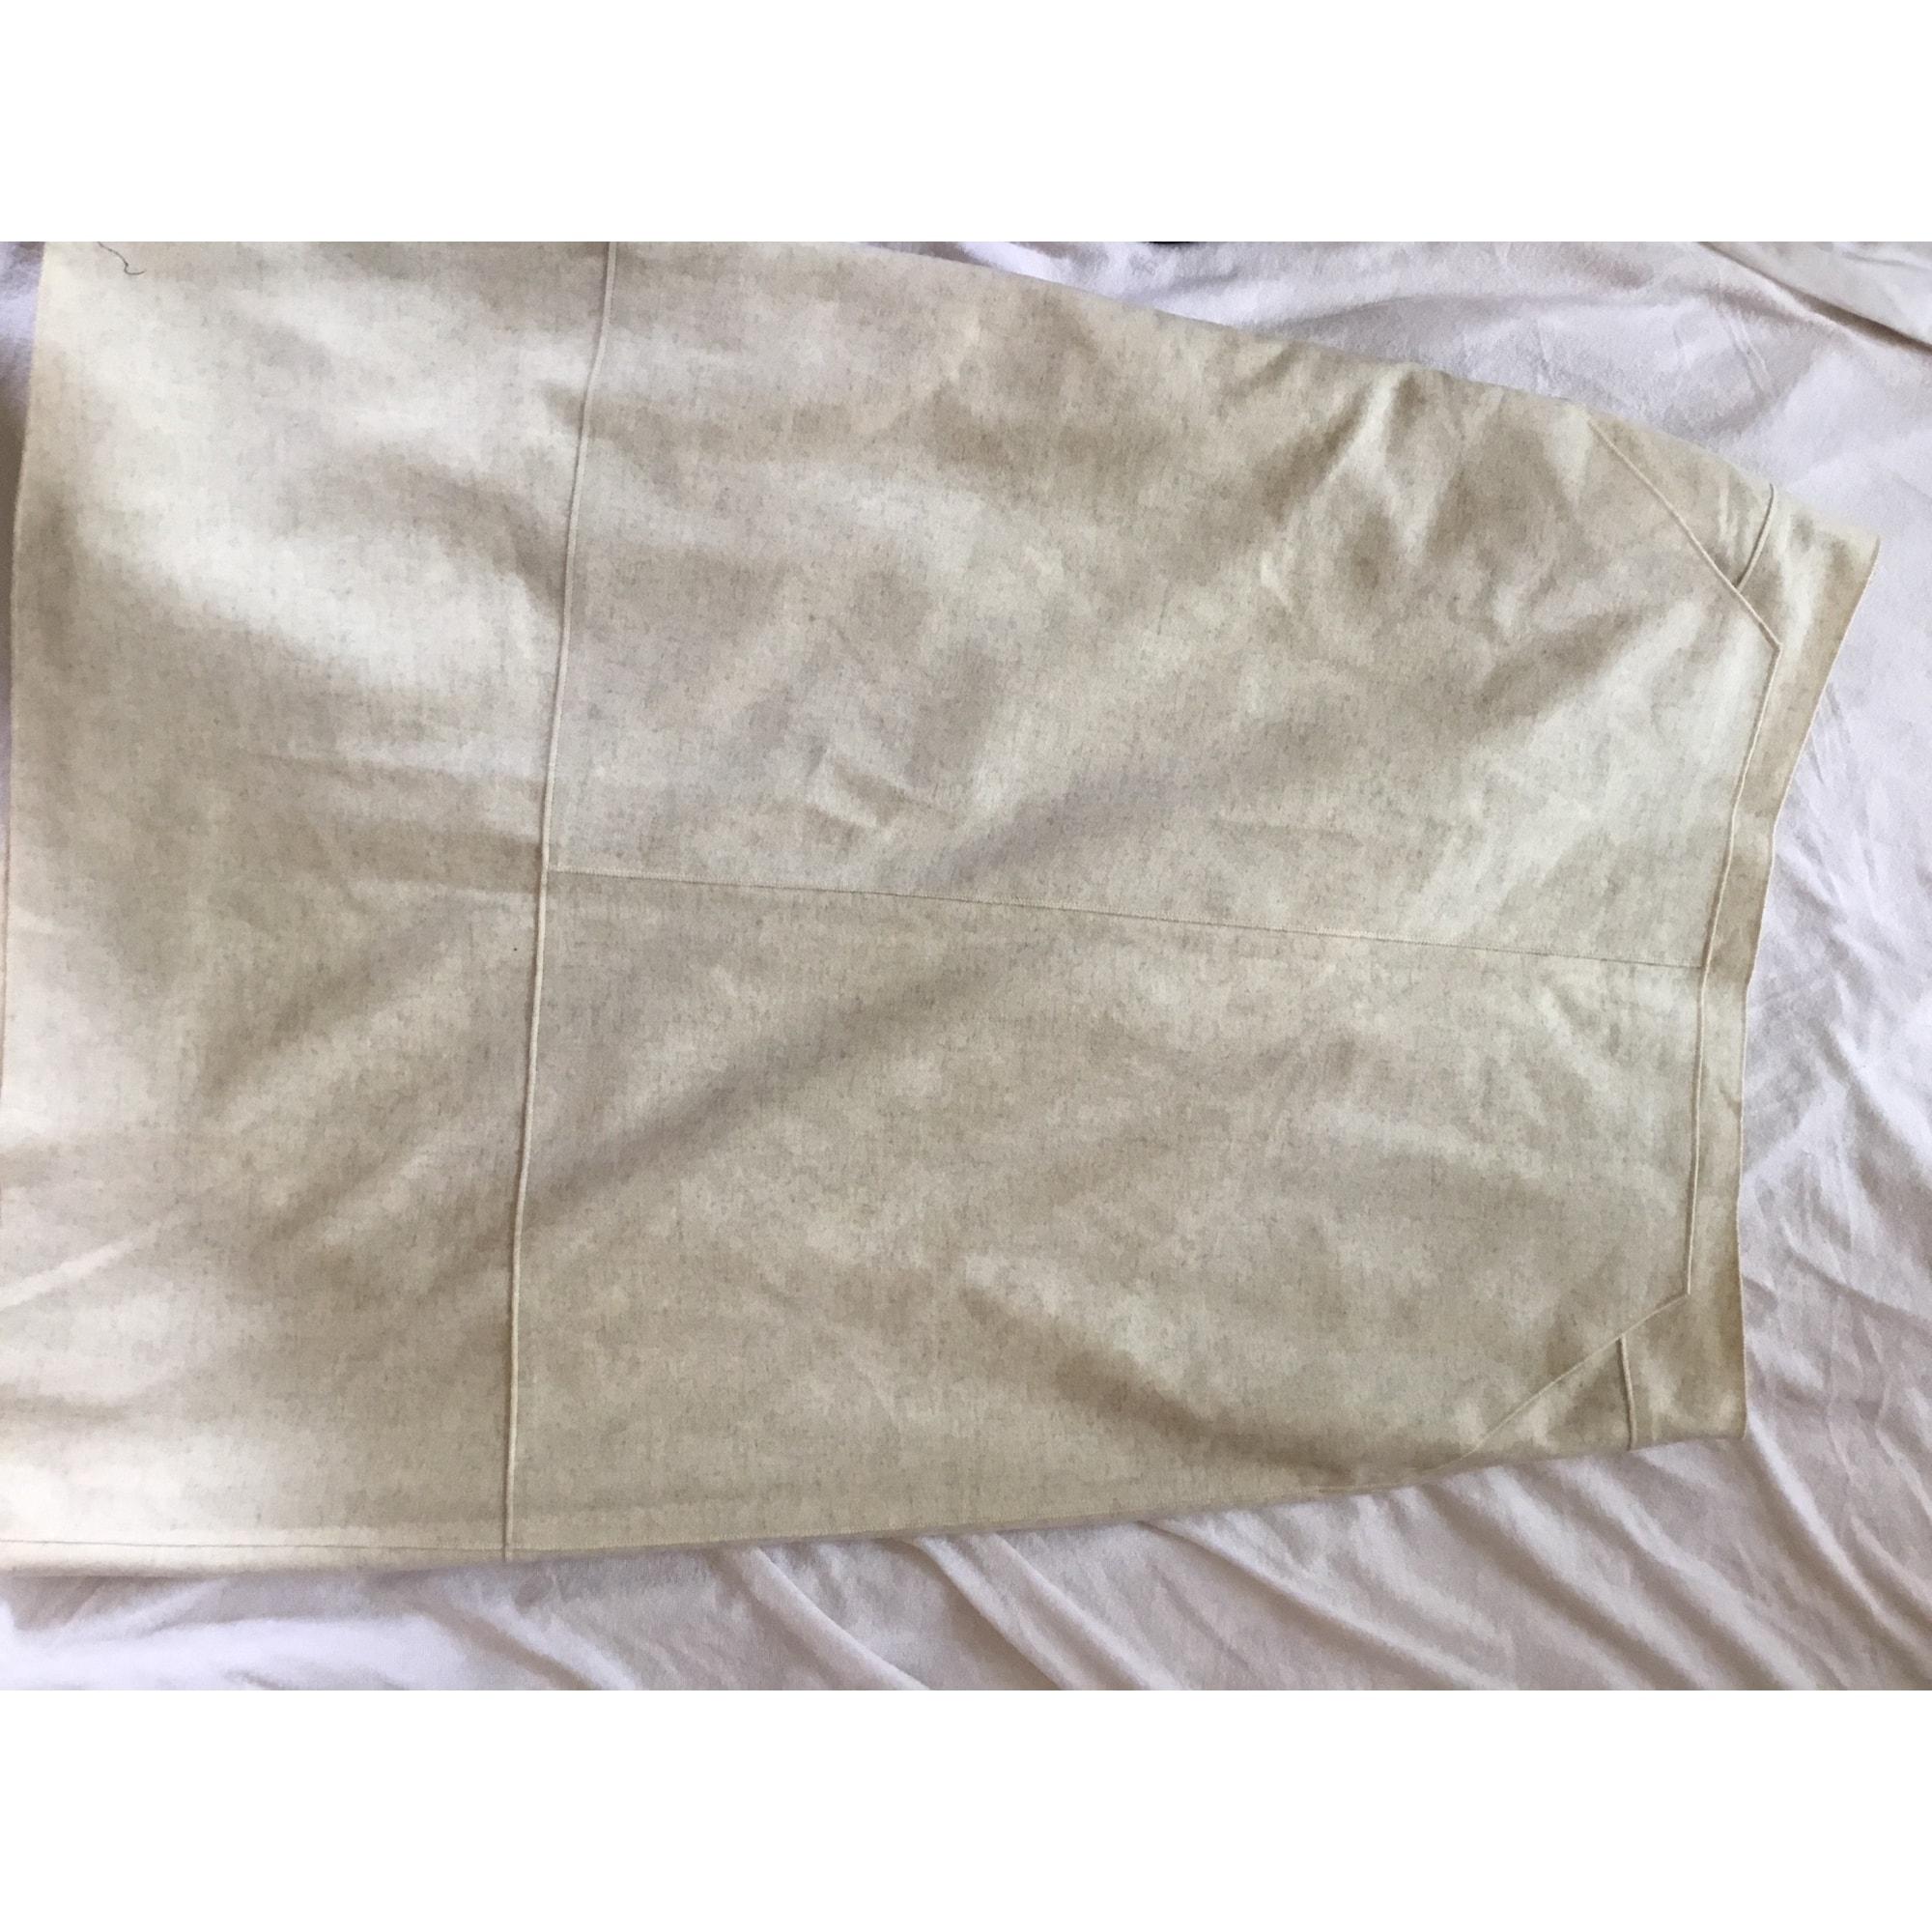 Jupe mi-longue MARINA RINALDI Blanc, blanc cassé, écru